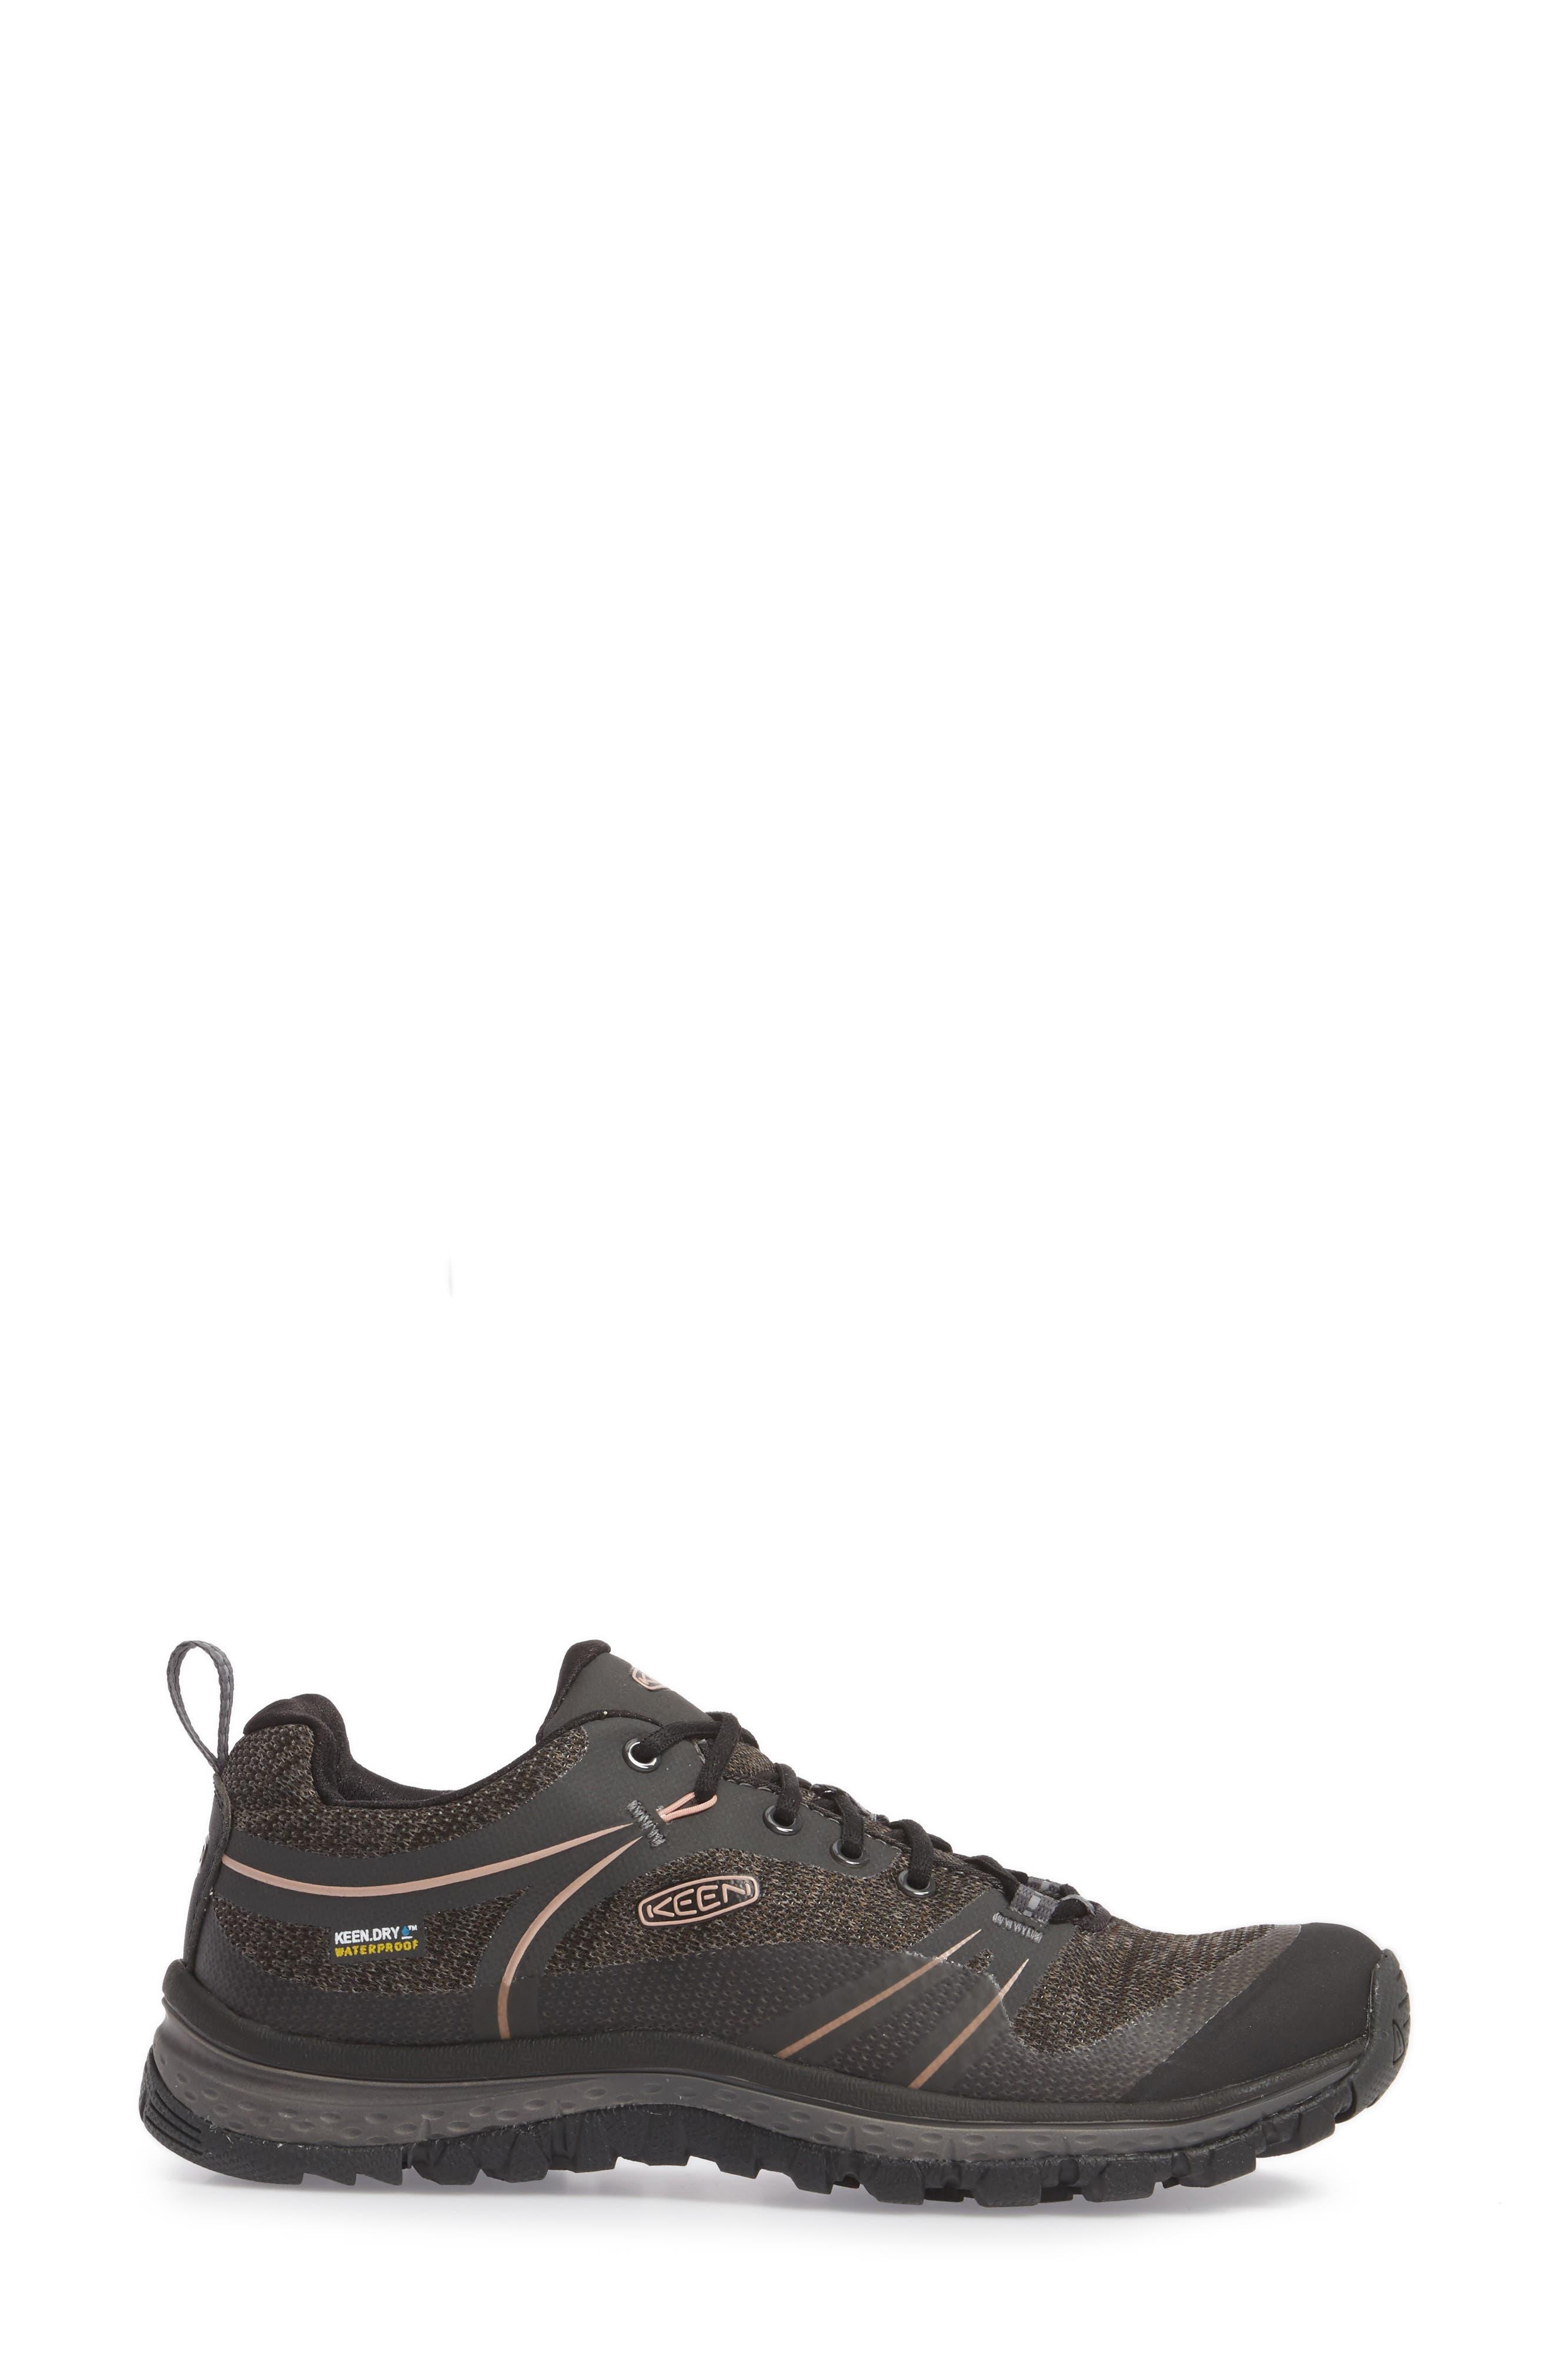 Terradora Waterproof Hiking Shoe,                             Alternate thumbnail 3, color,                             RAVEN/ ROSE DAWN